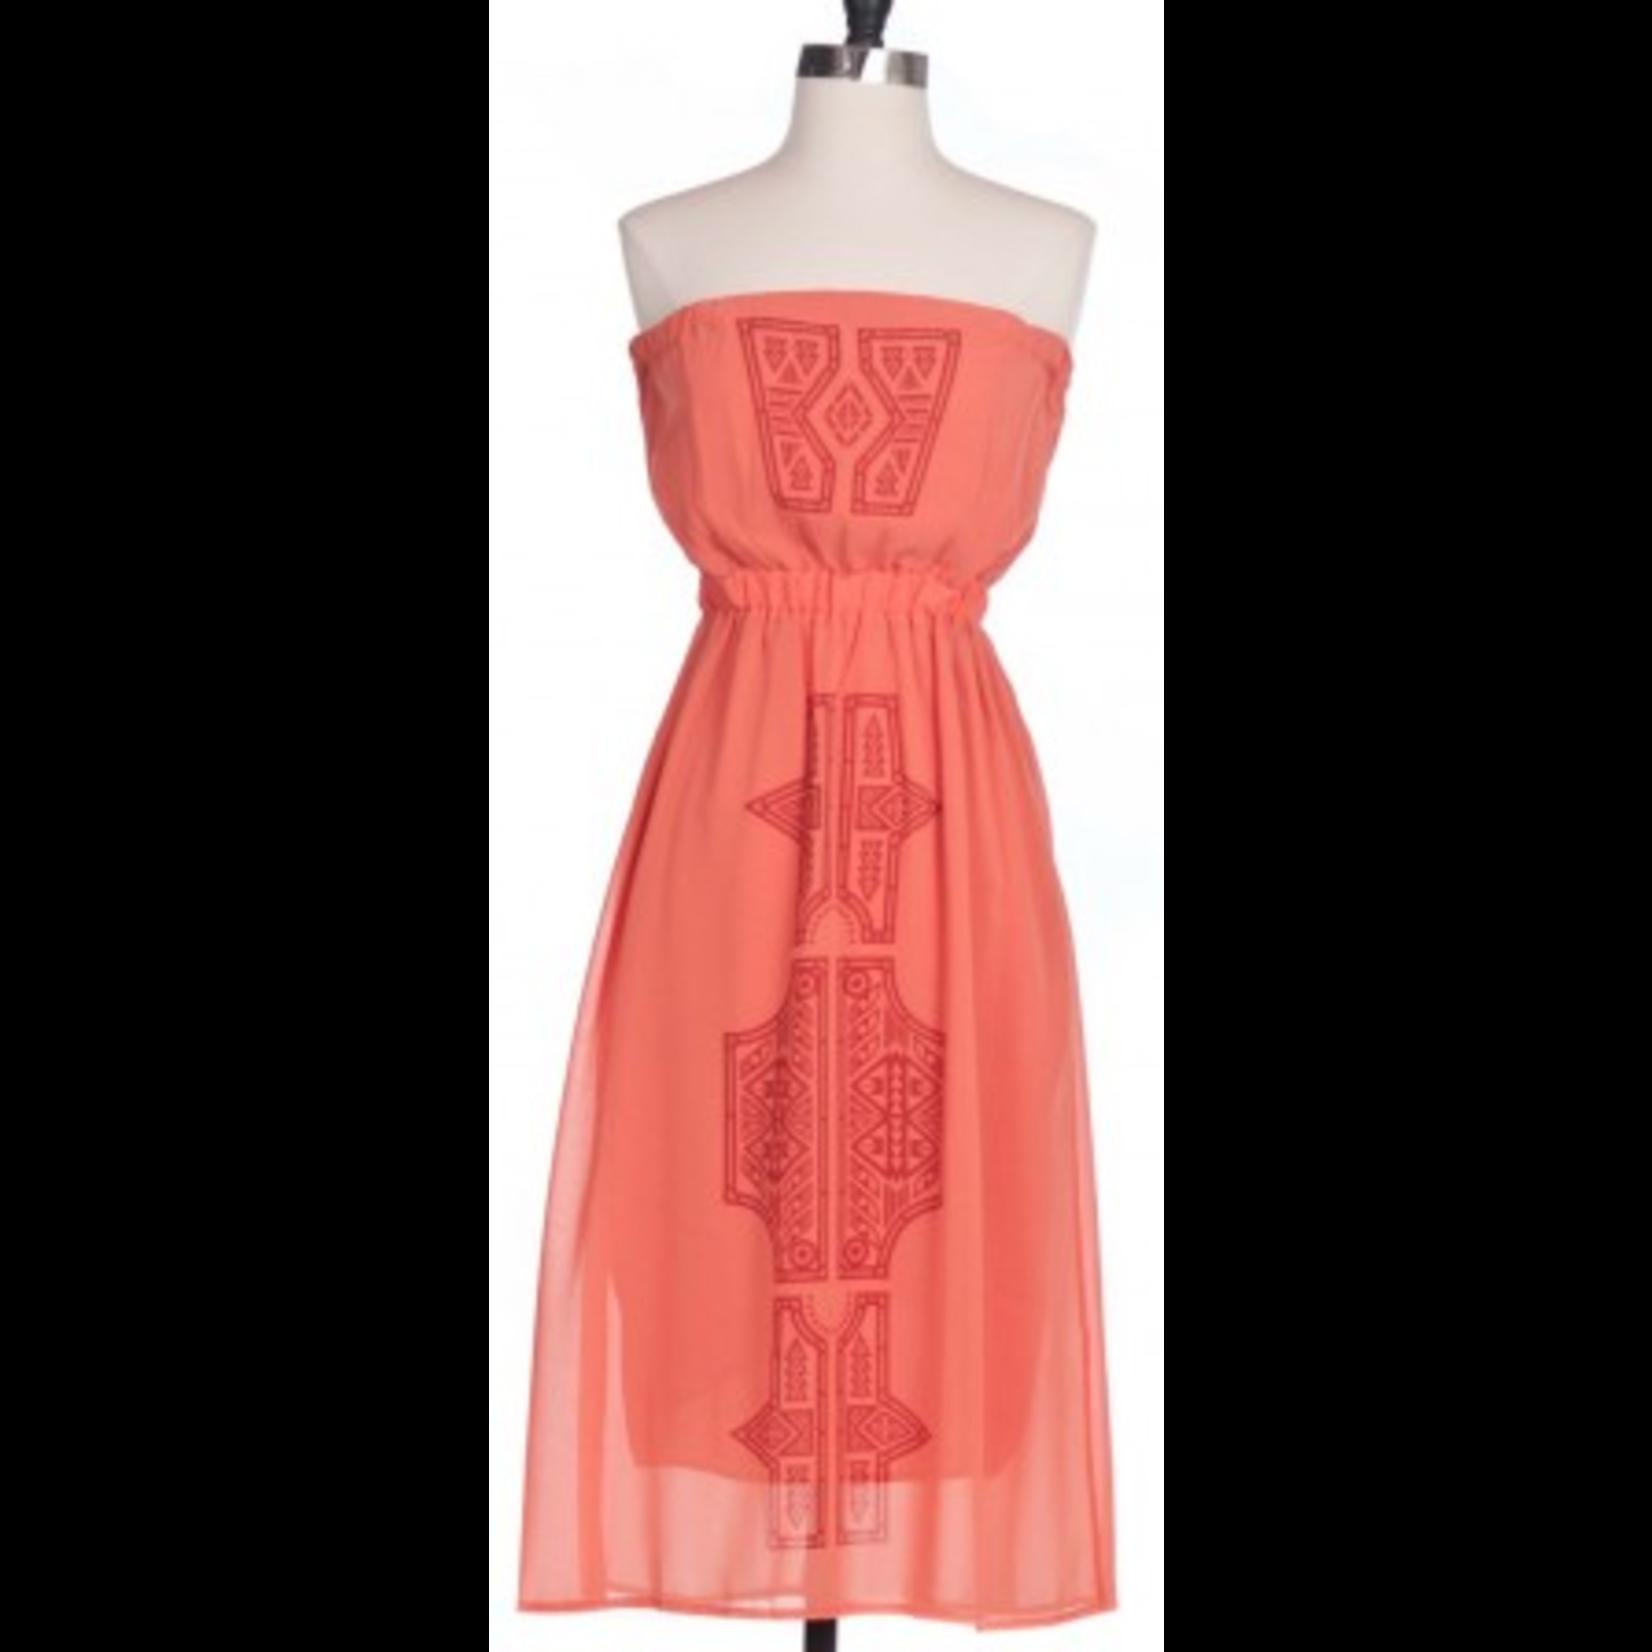 Gentle Fawn Gentle Fawn Fragment Dress, sale item, $69 was $115